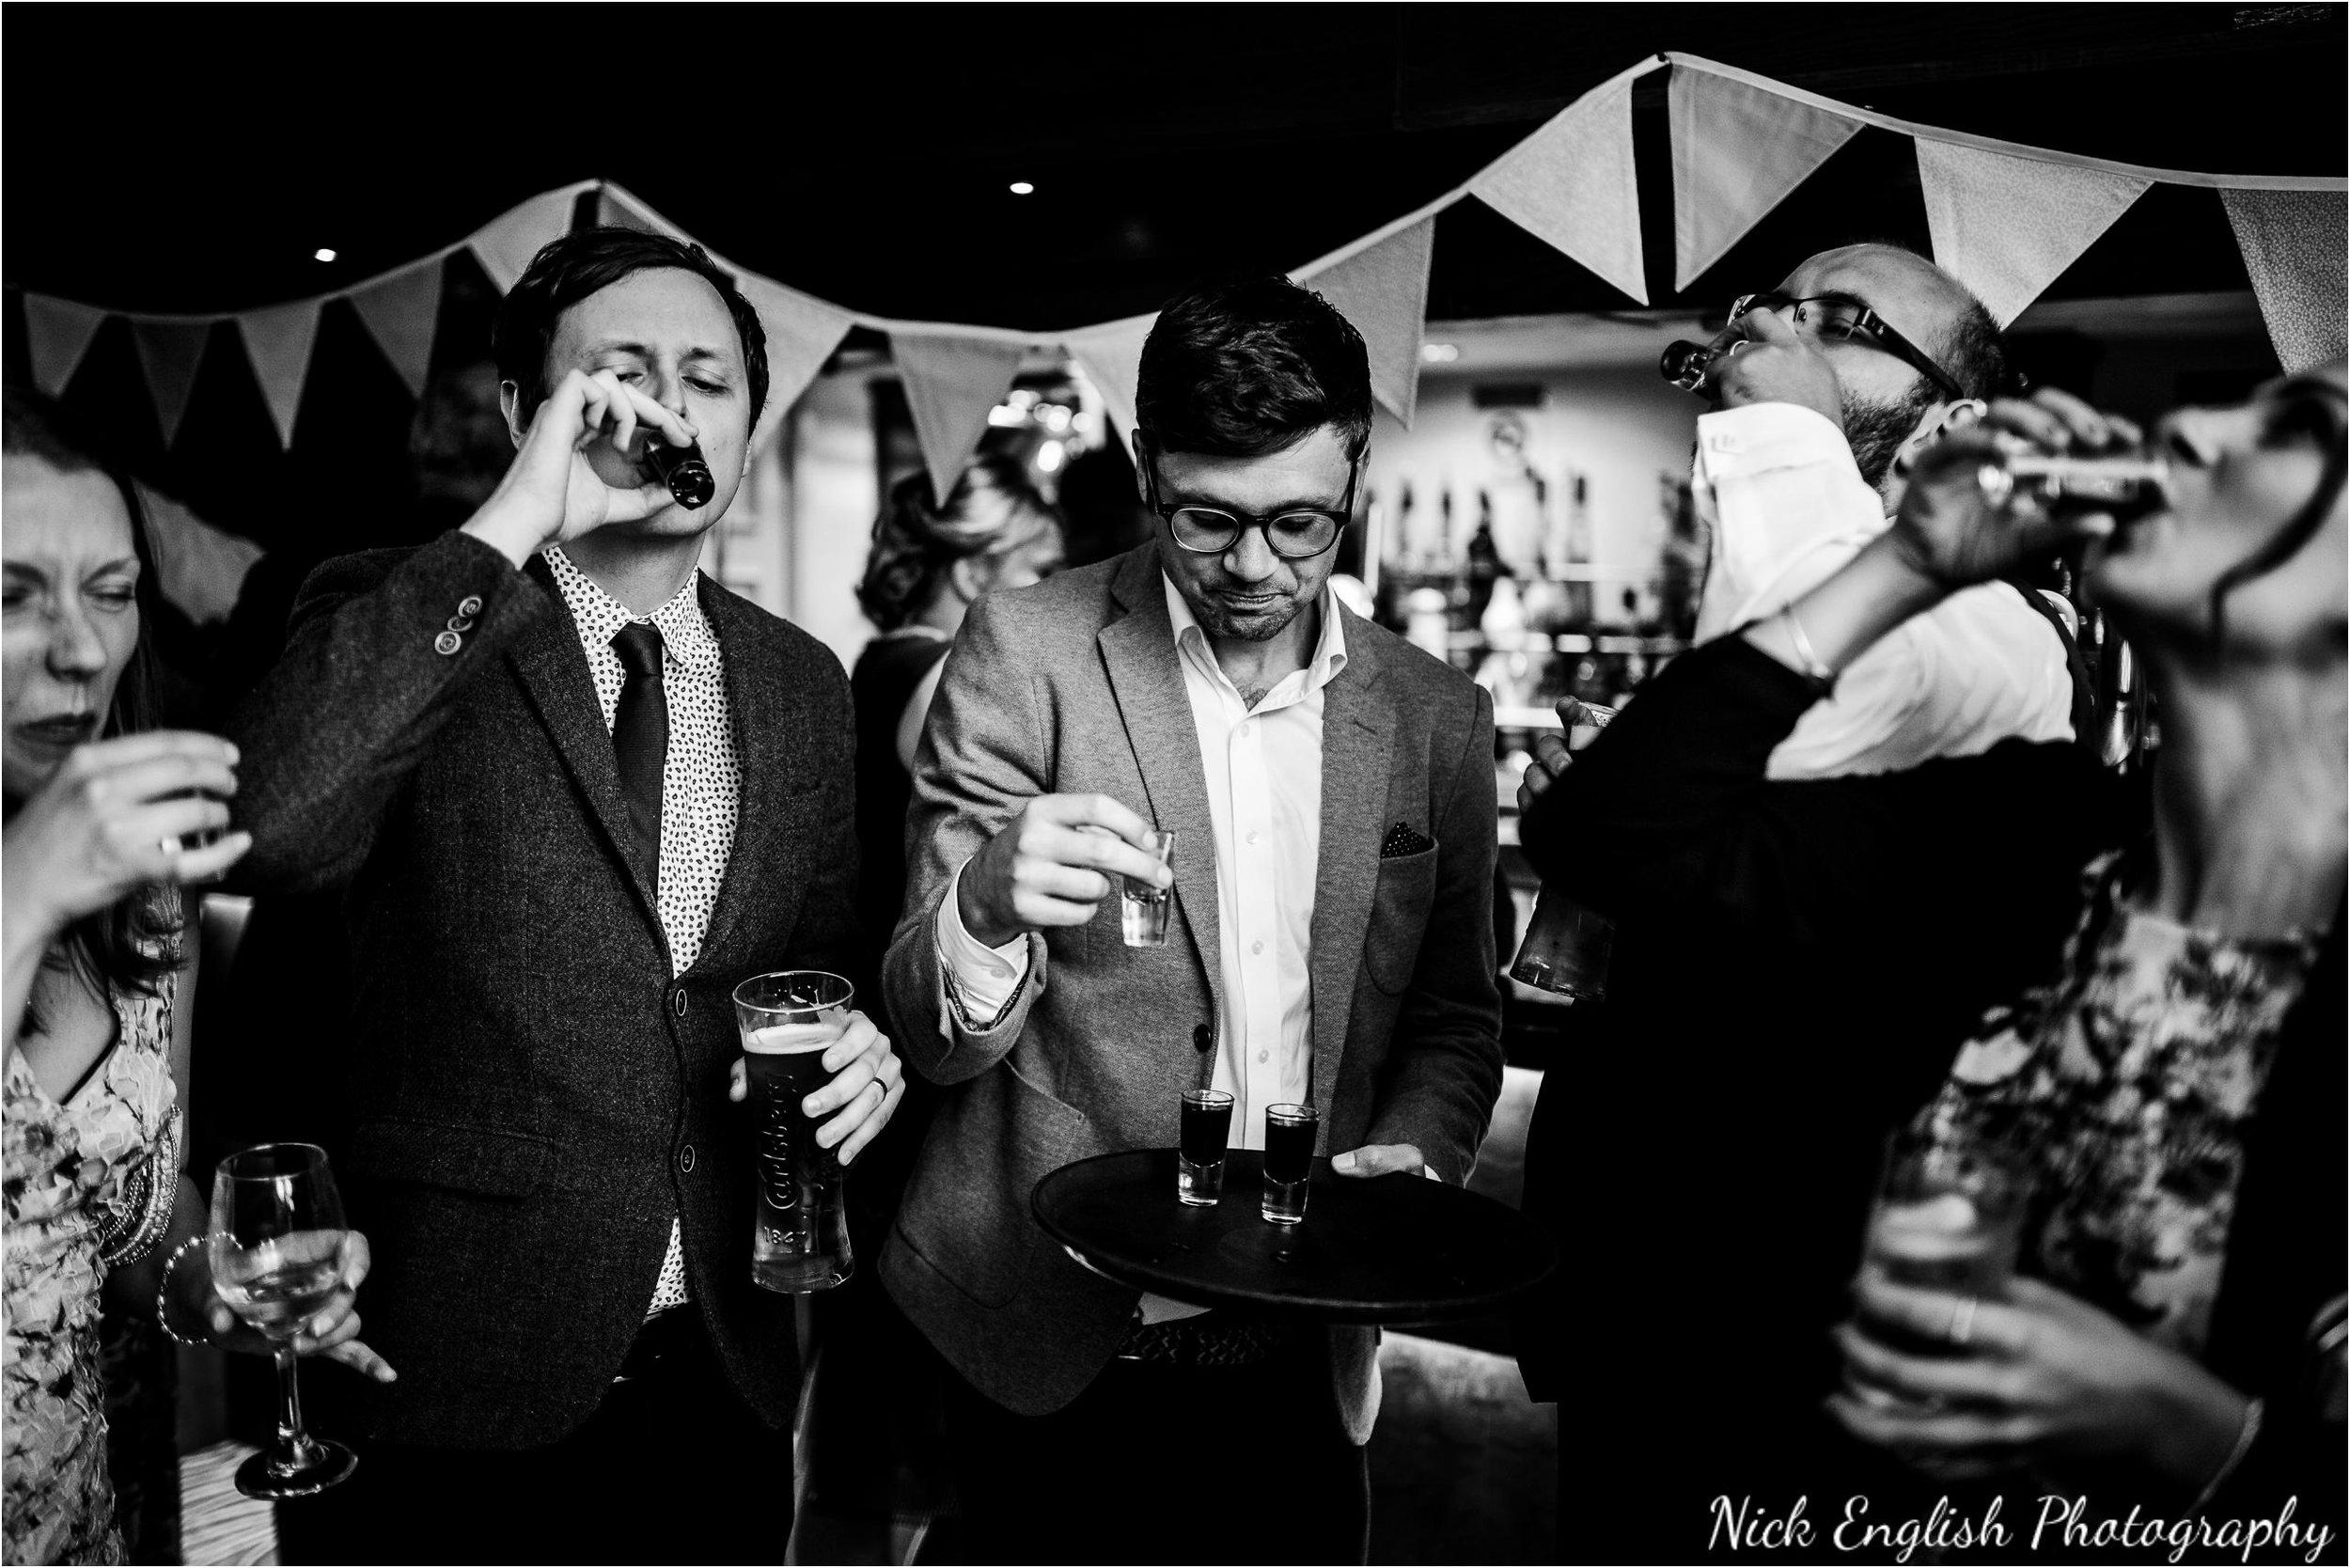 Emily David Wedding Photographs at Barton Grange Preston by Nick English Photography 216jpg.jpeg